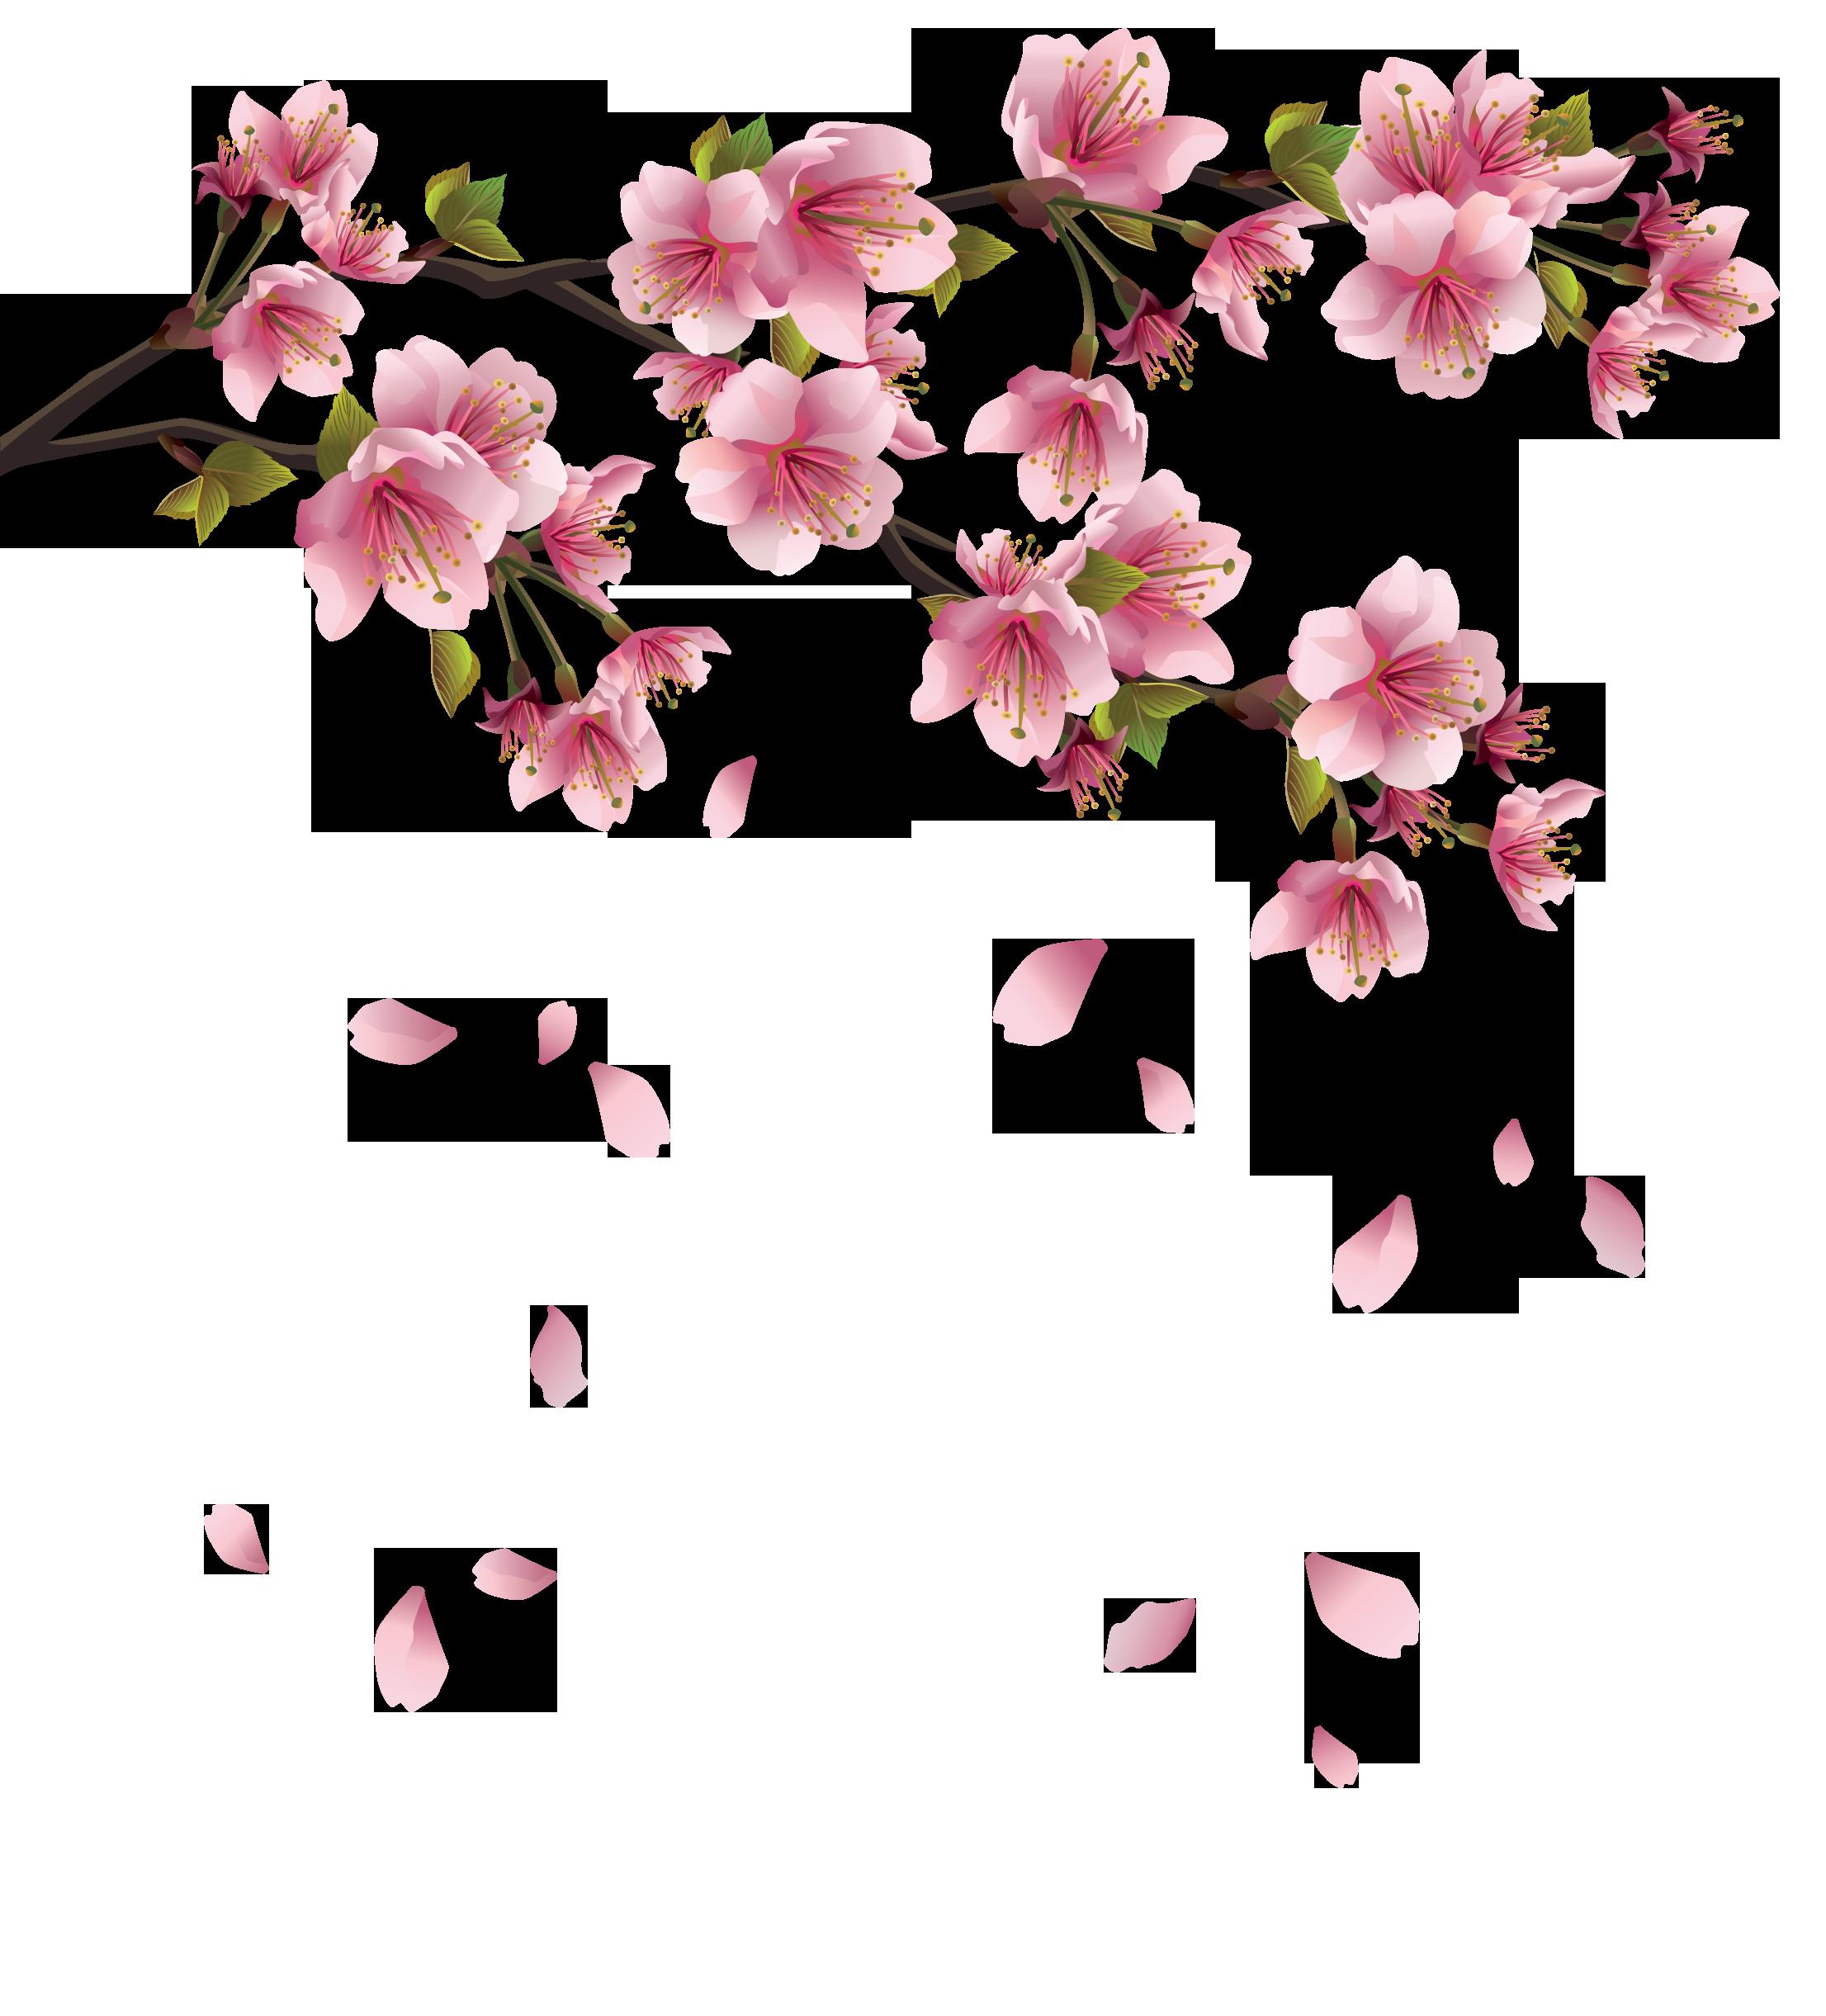 нужно розовая сакура картинки на прозрачном фоне заканчивается согласно